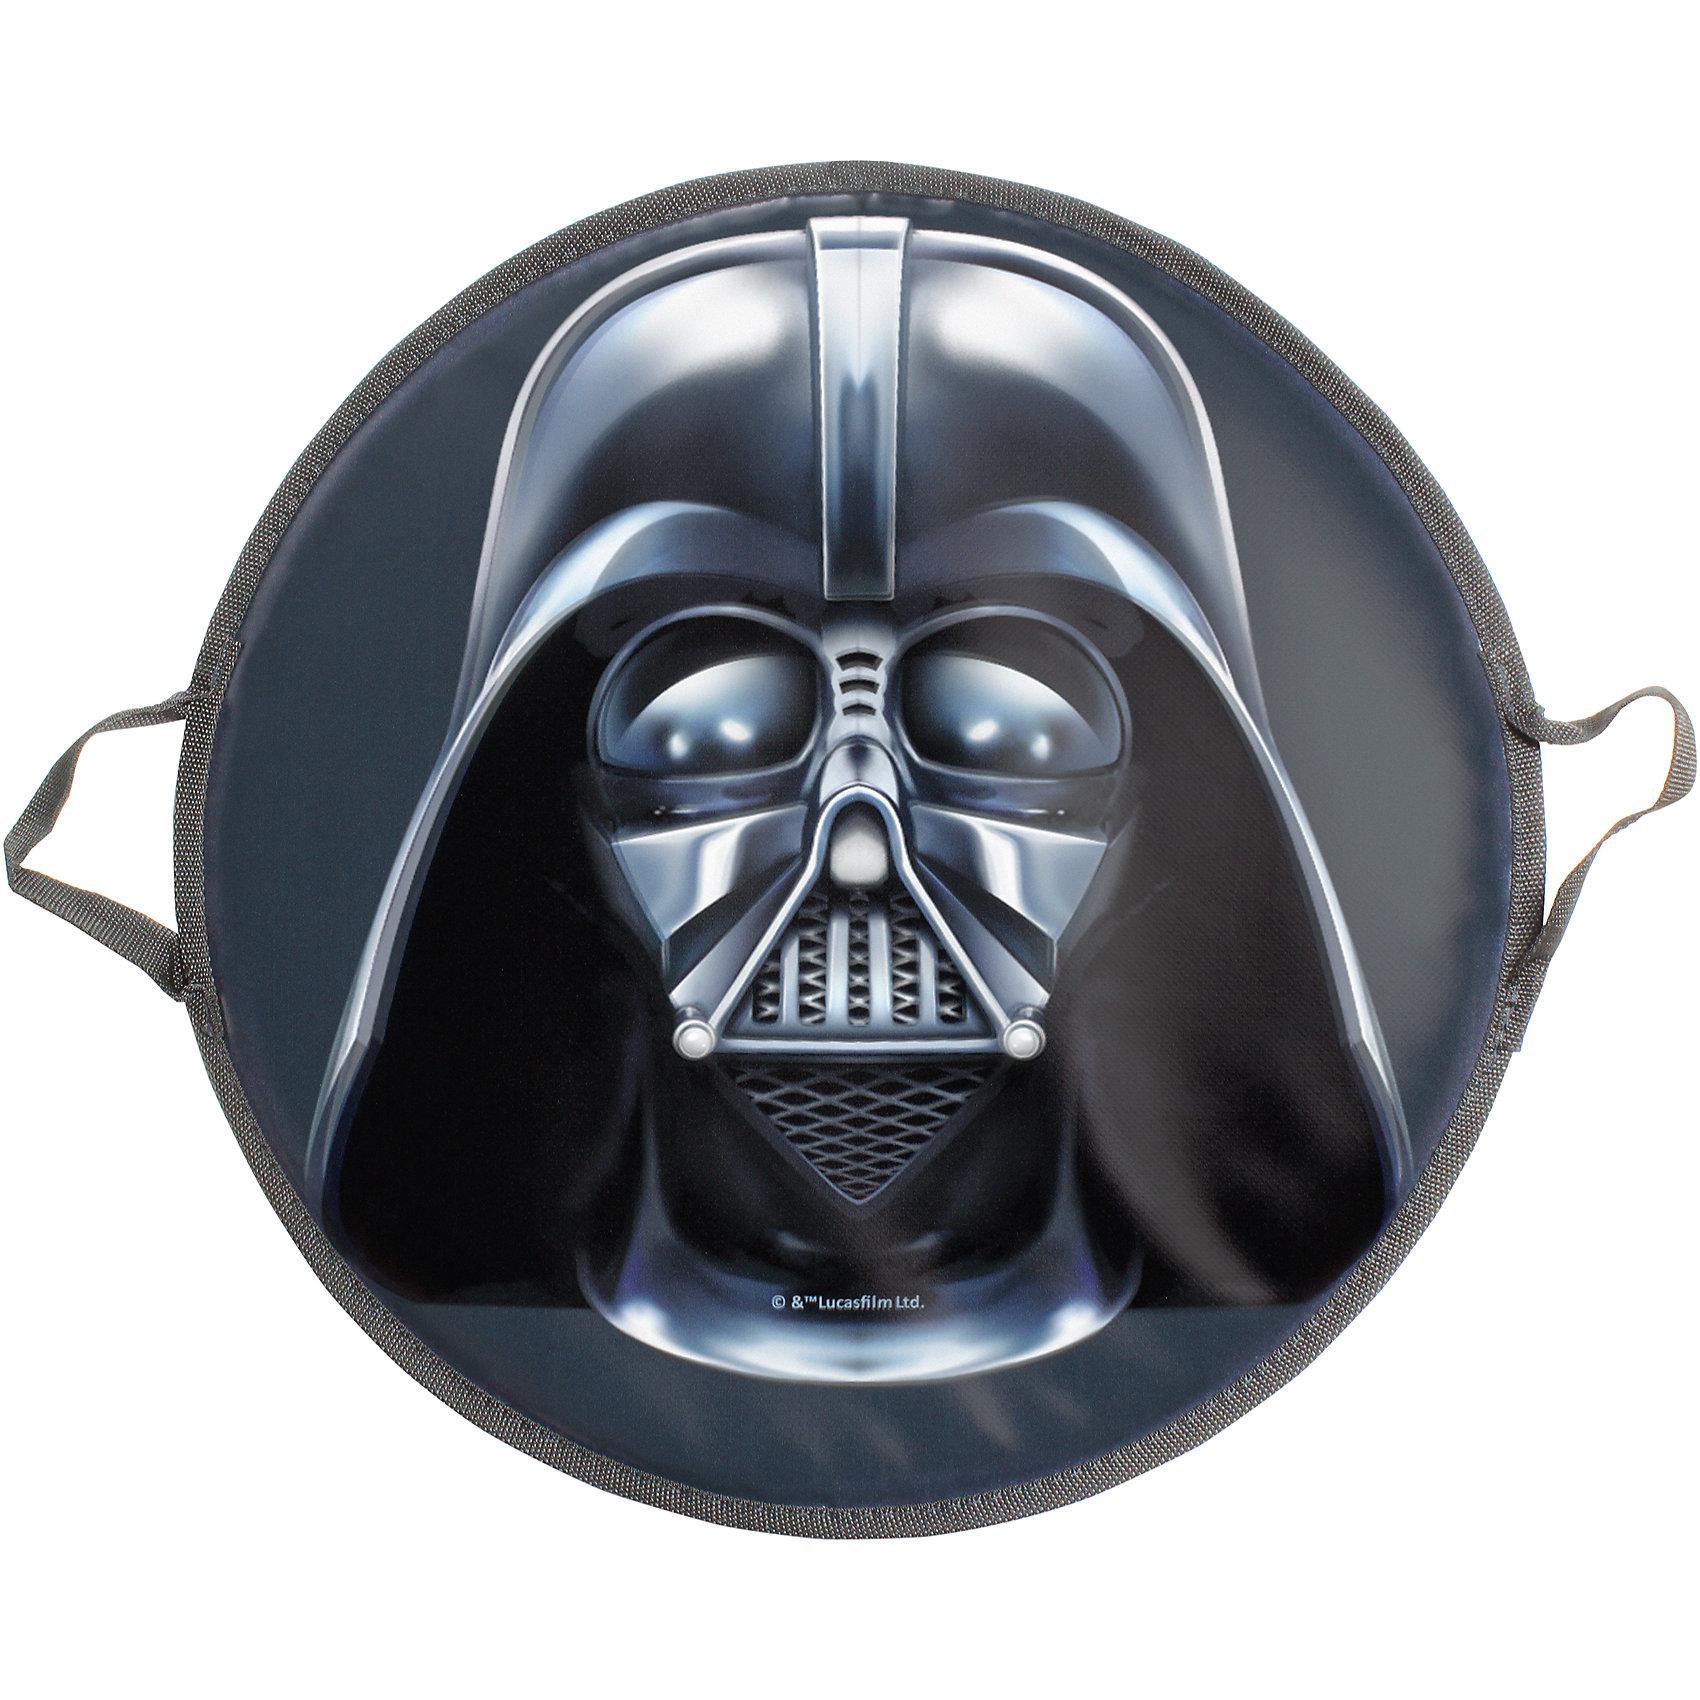 Ледянка Darth Vader,  52 см, круглая, Звездные войны